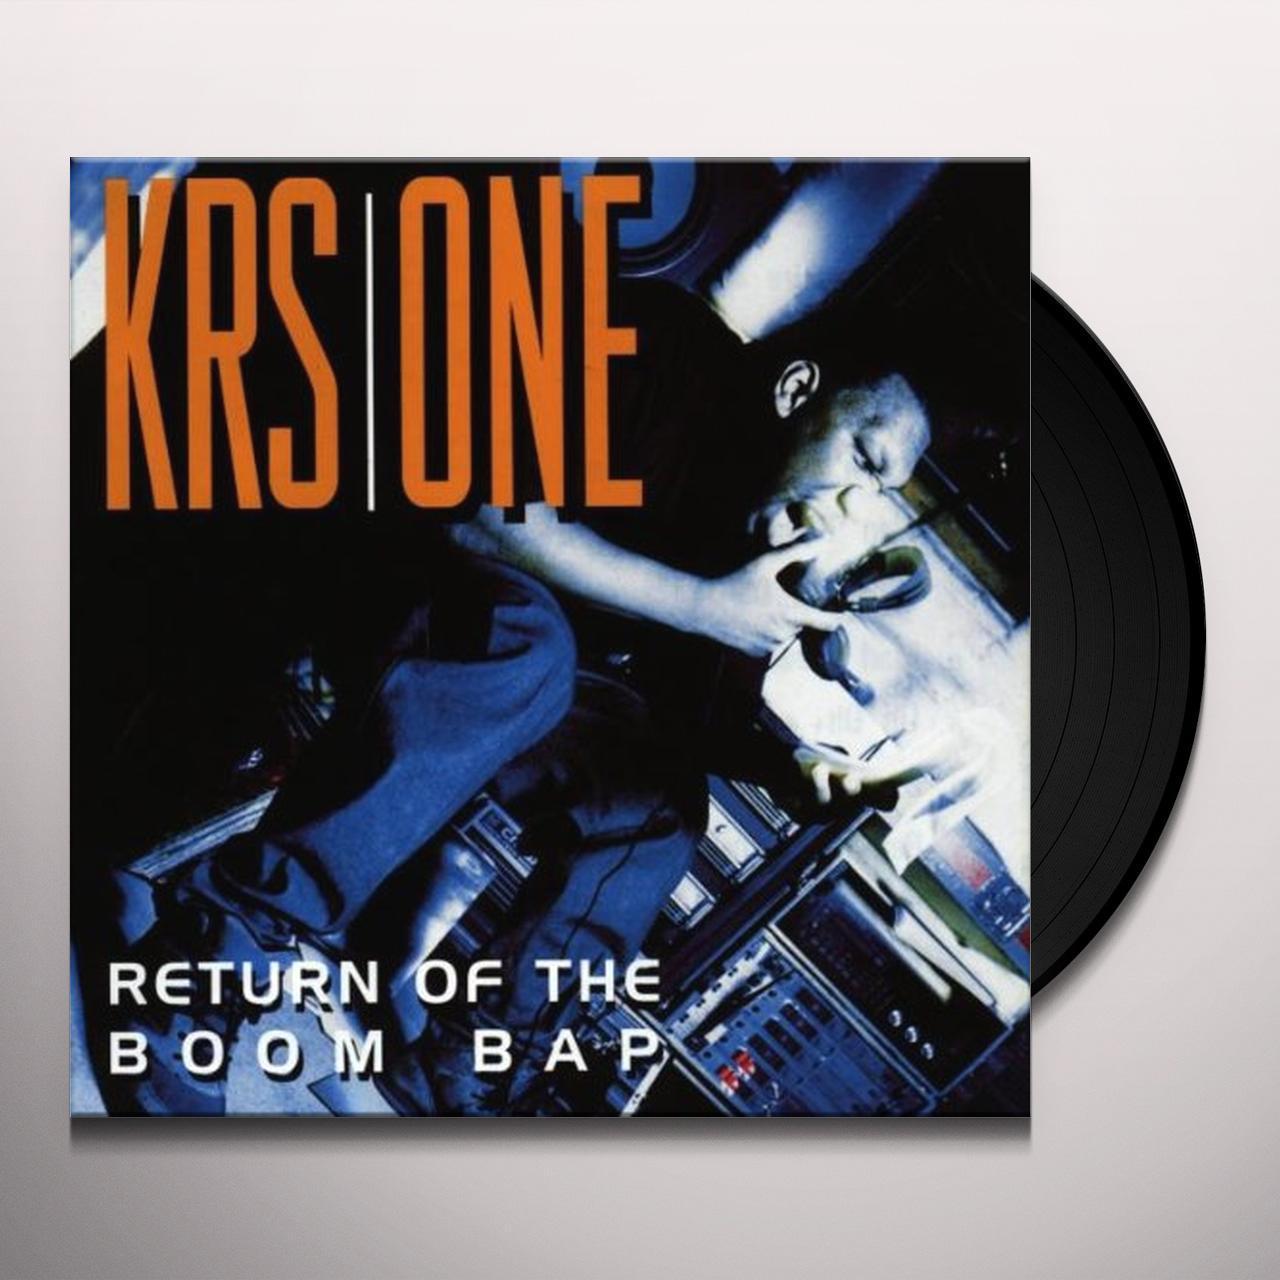 Krs one return of the boom bap vinyl record malvernweather Gallery